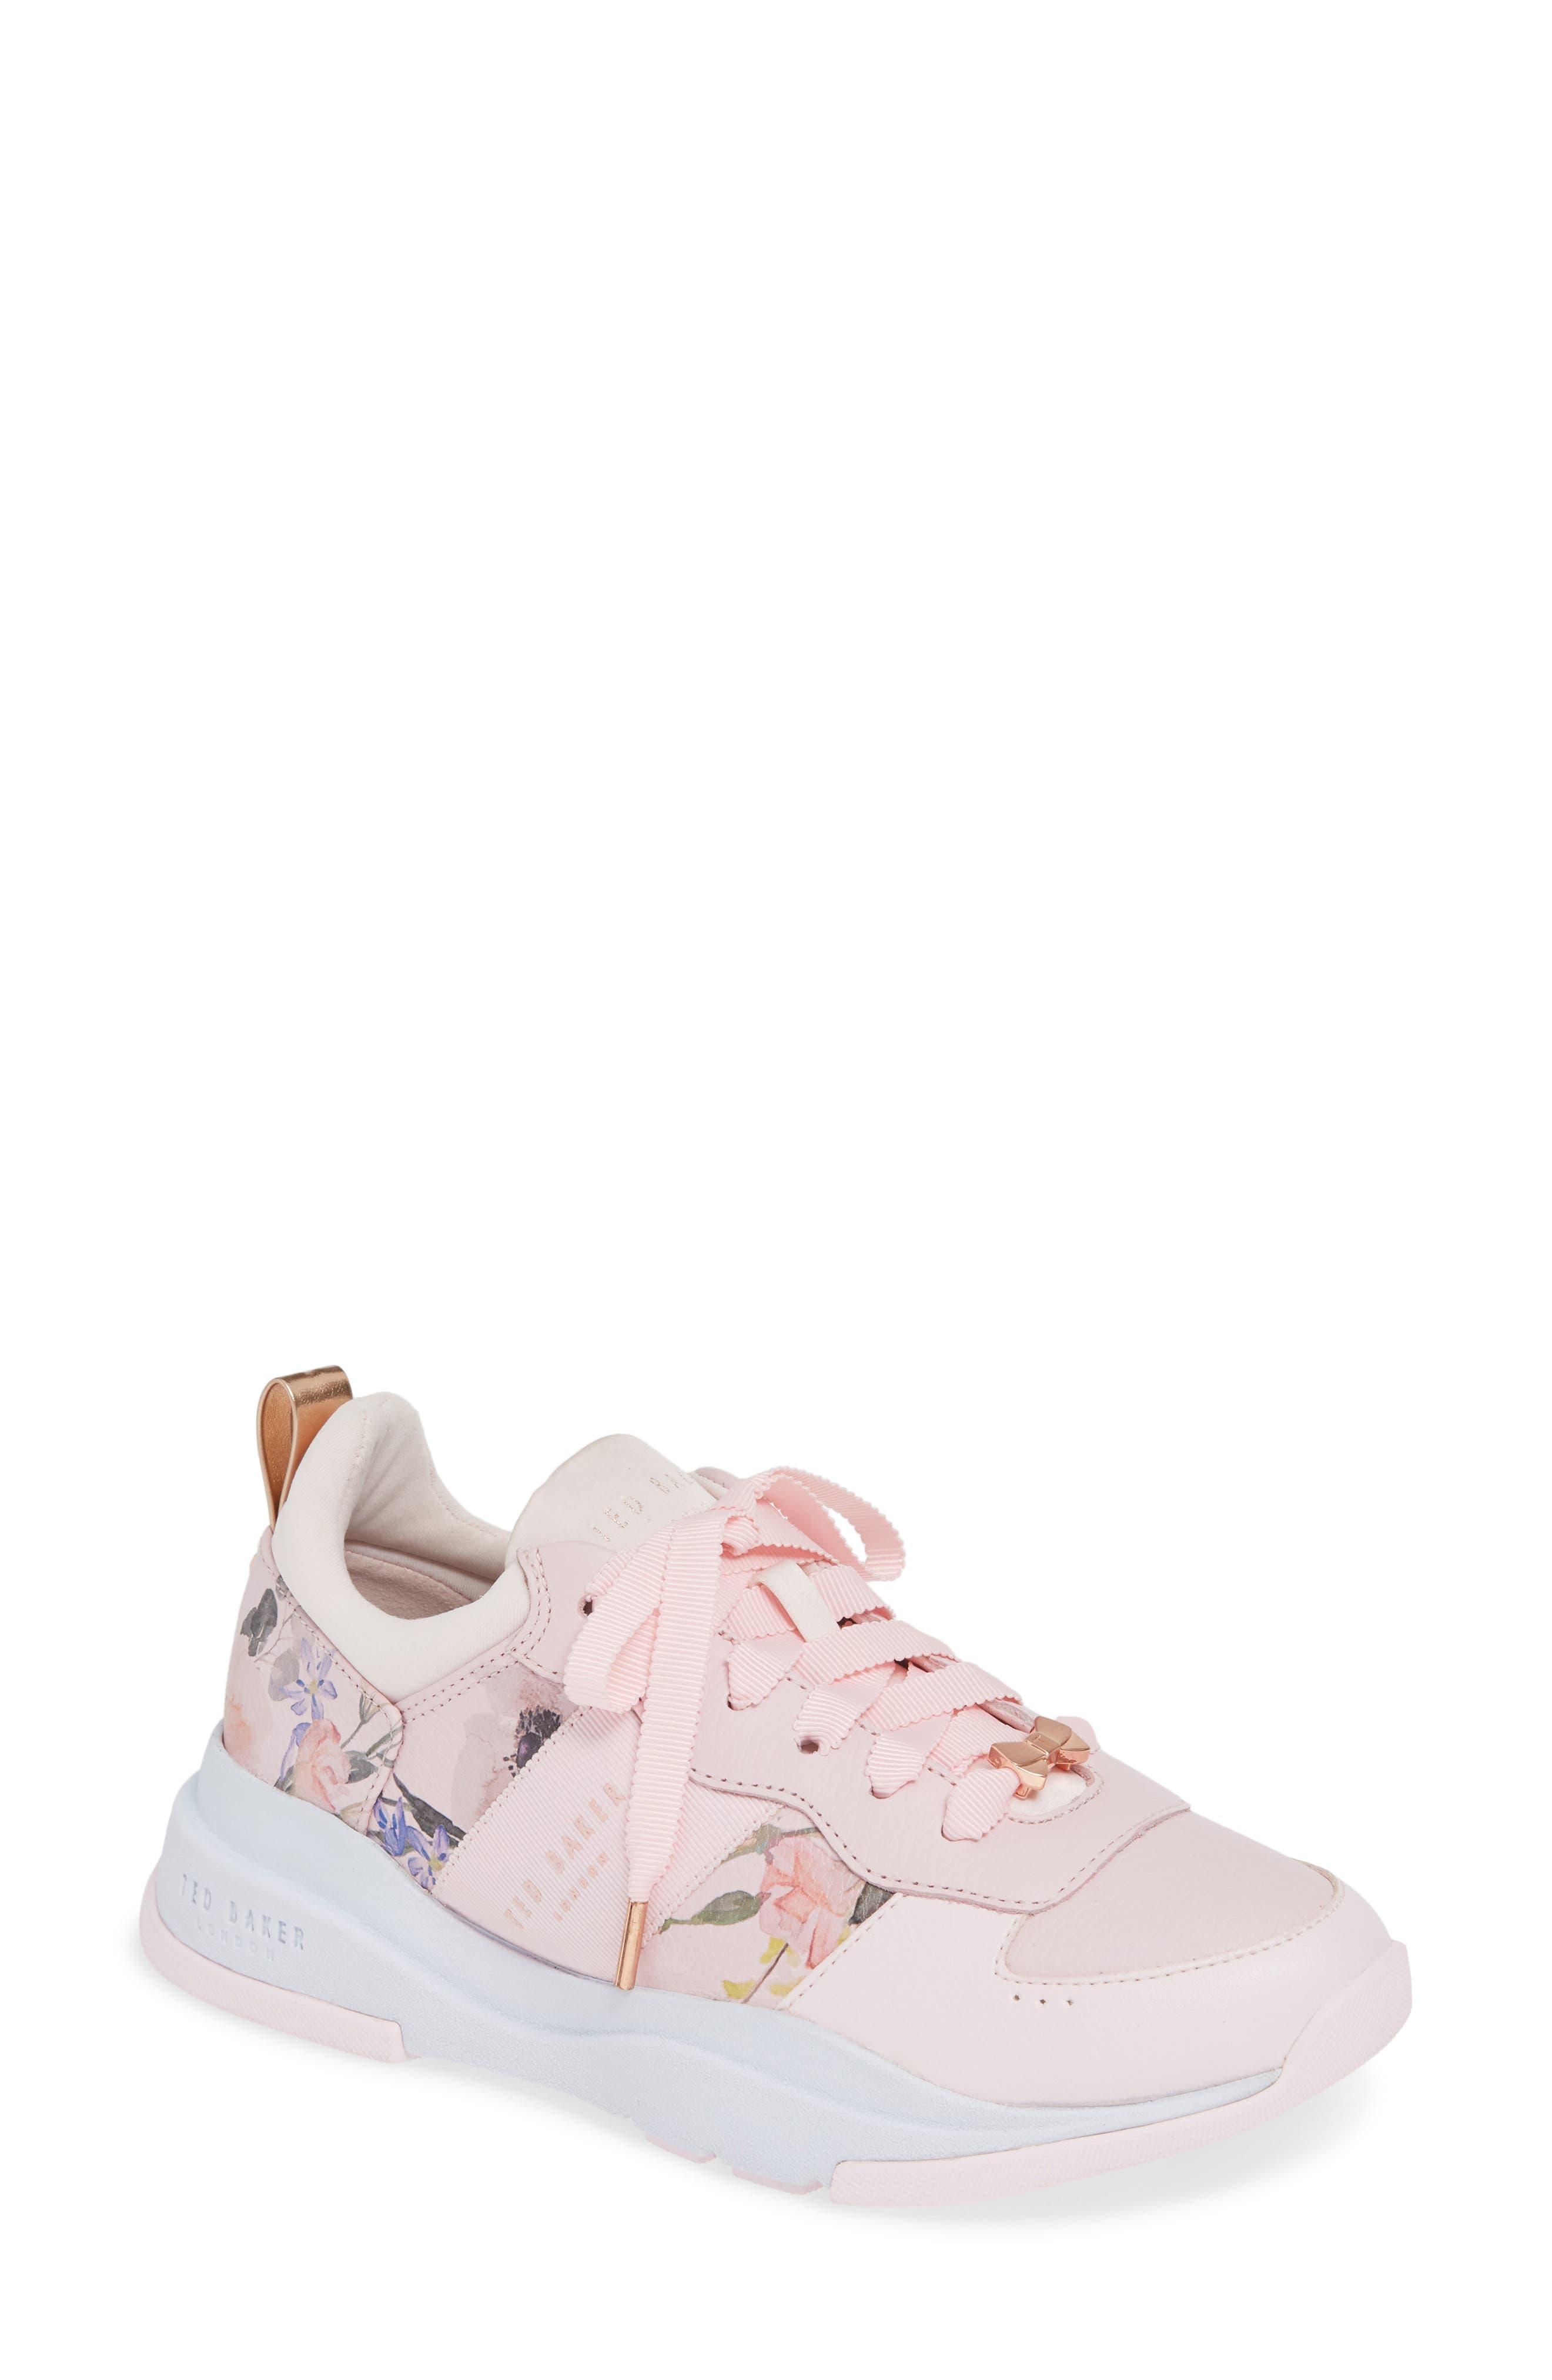 Ted Baker London Waverdi Sneaker, Pink